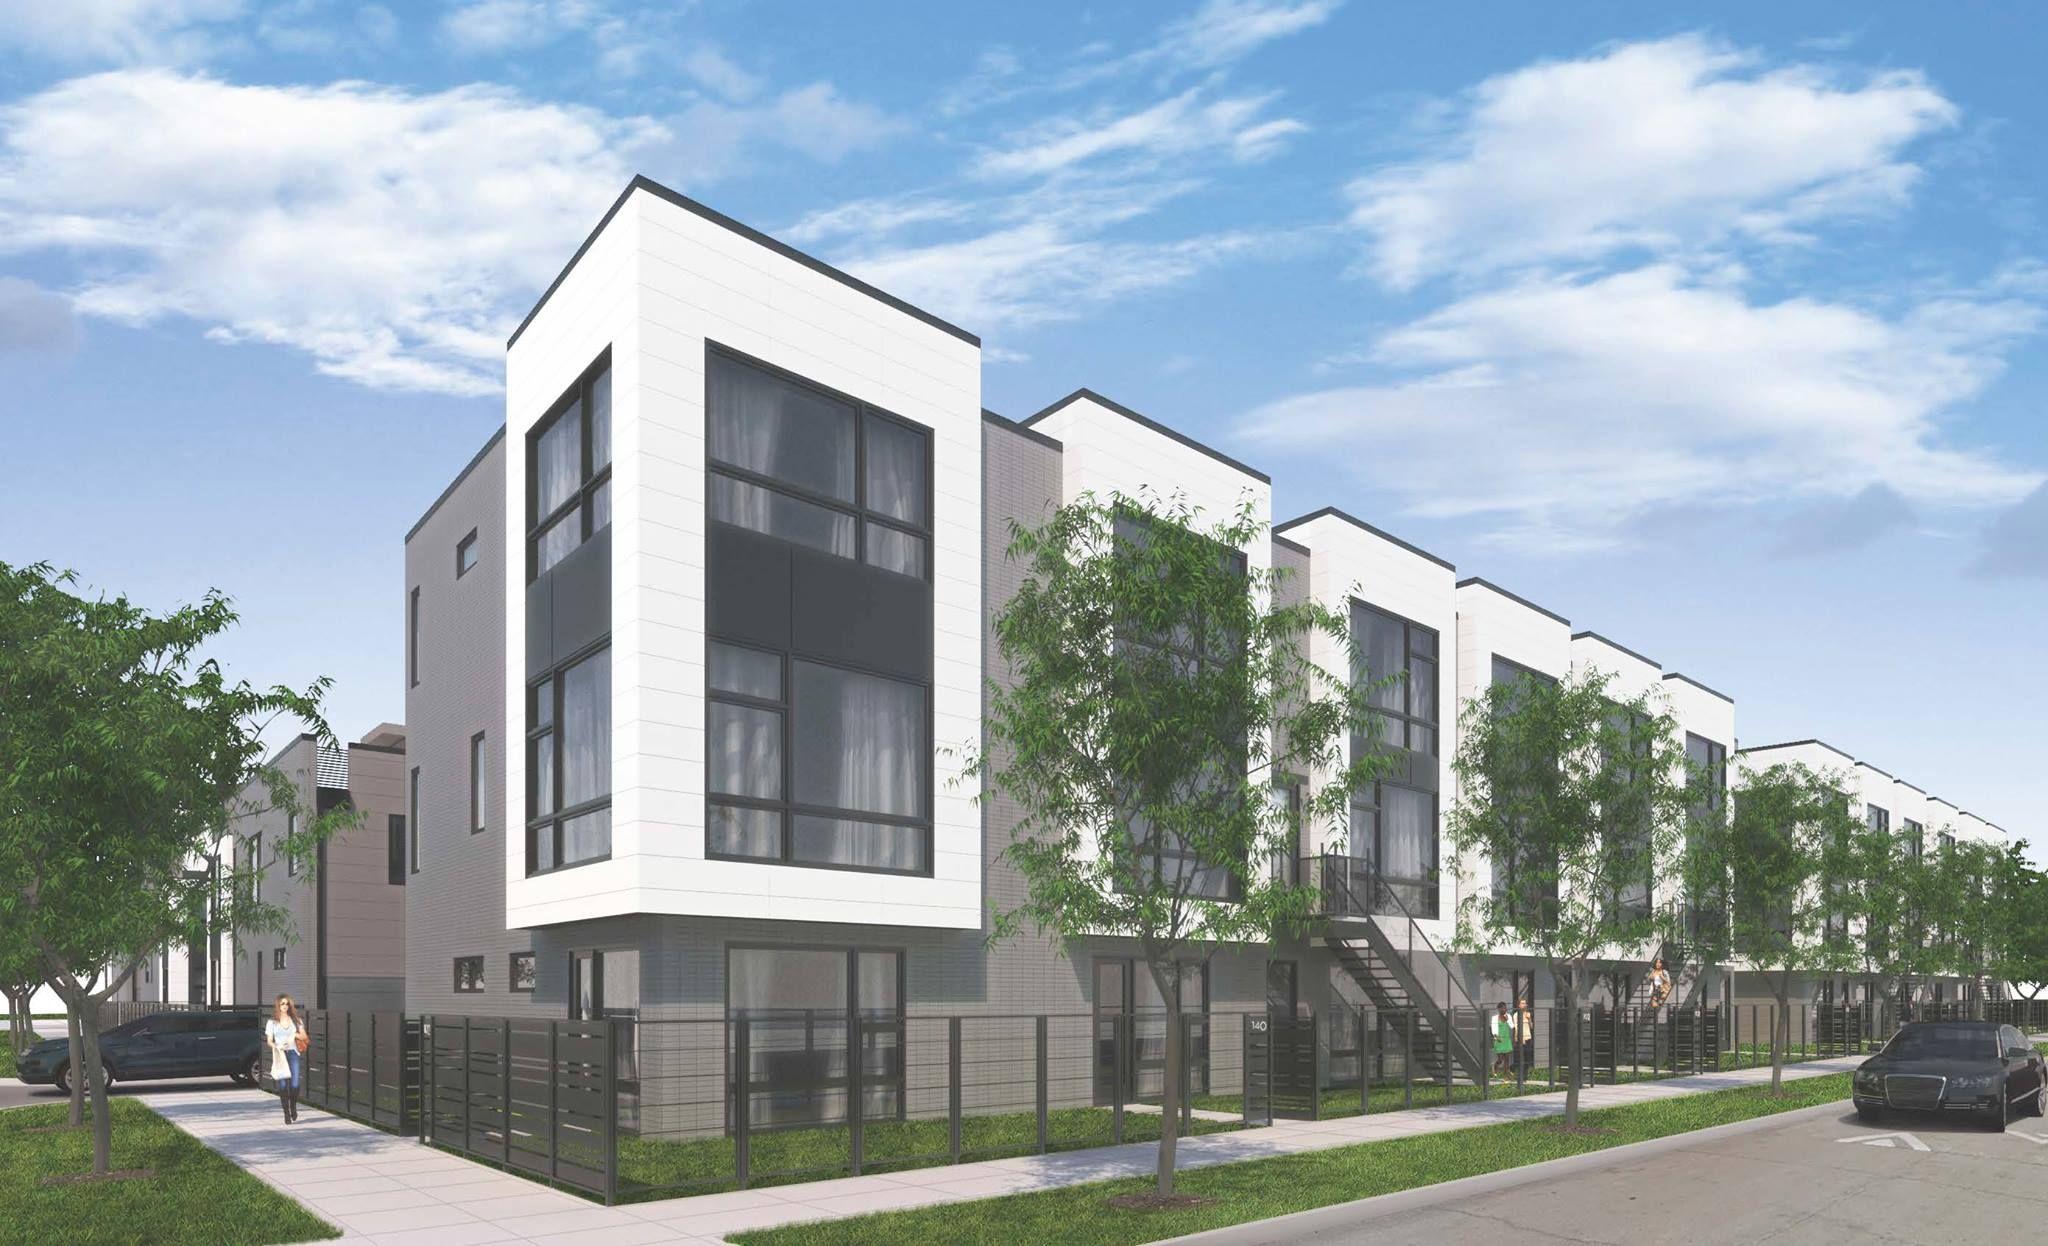 lg construction + development: basecamp condos & town homes, chicago